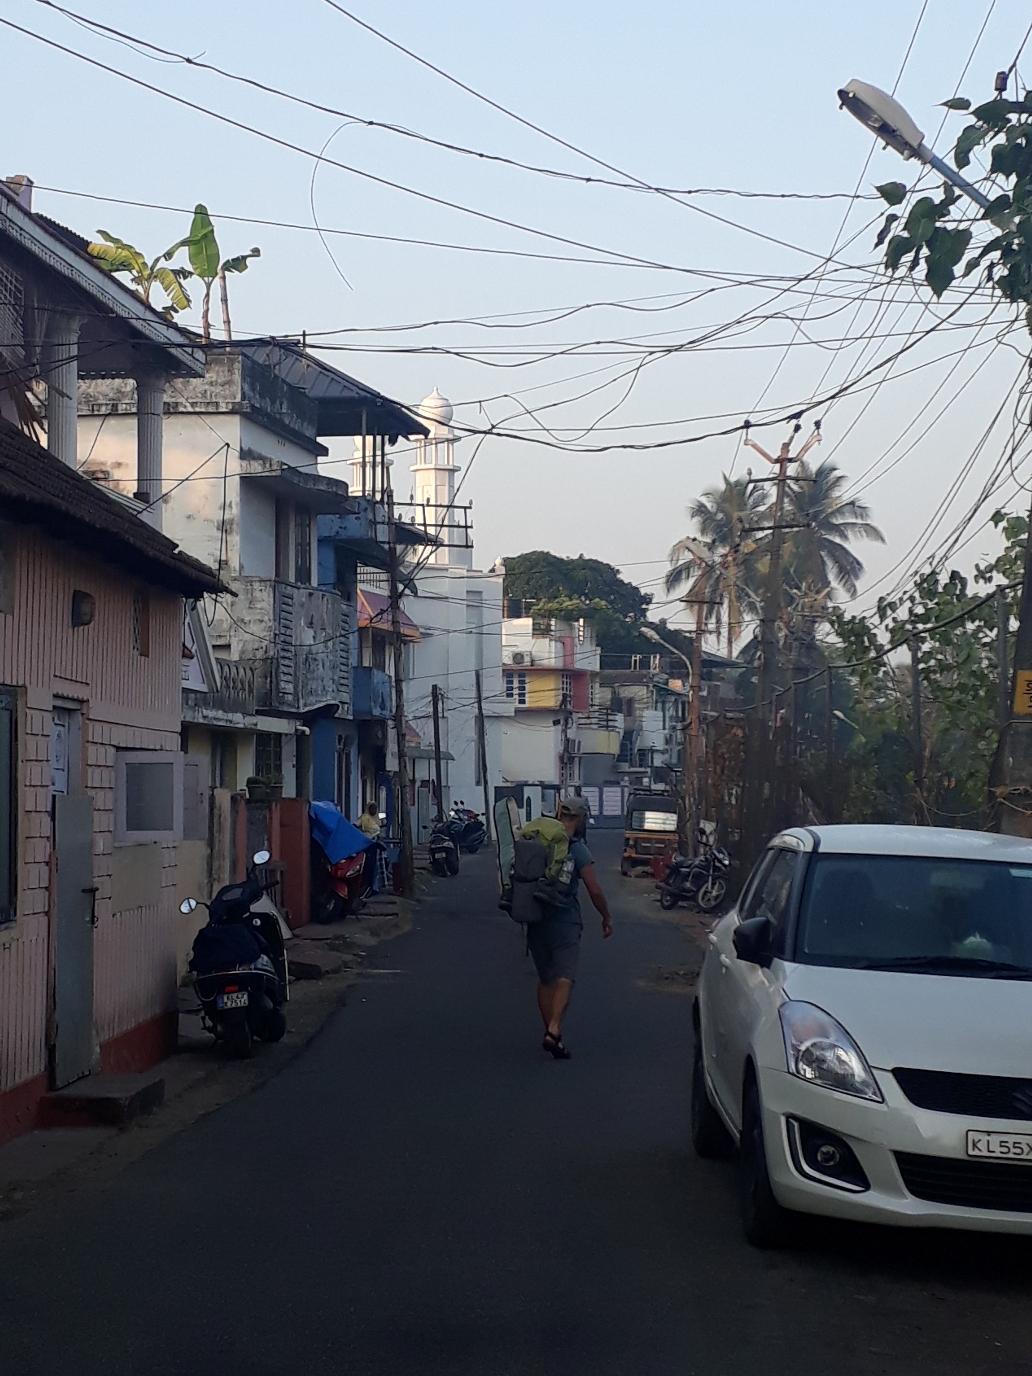 Auf dem Weg zum Fort Kochi